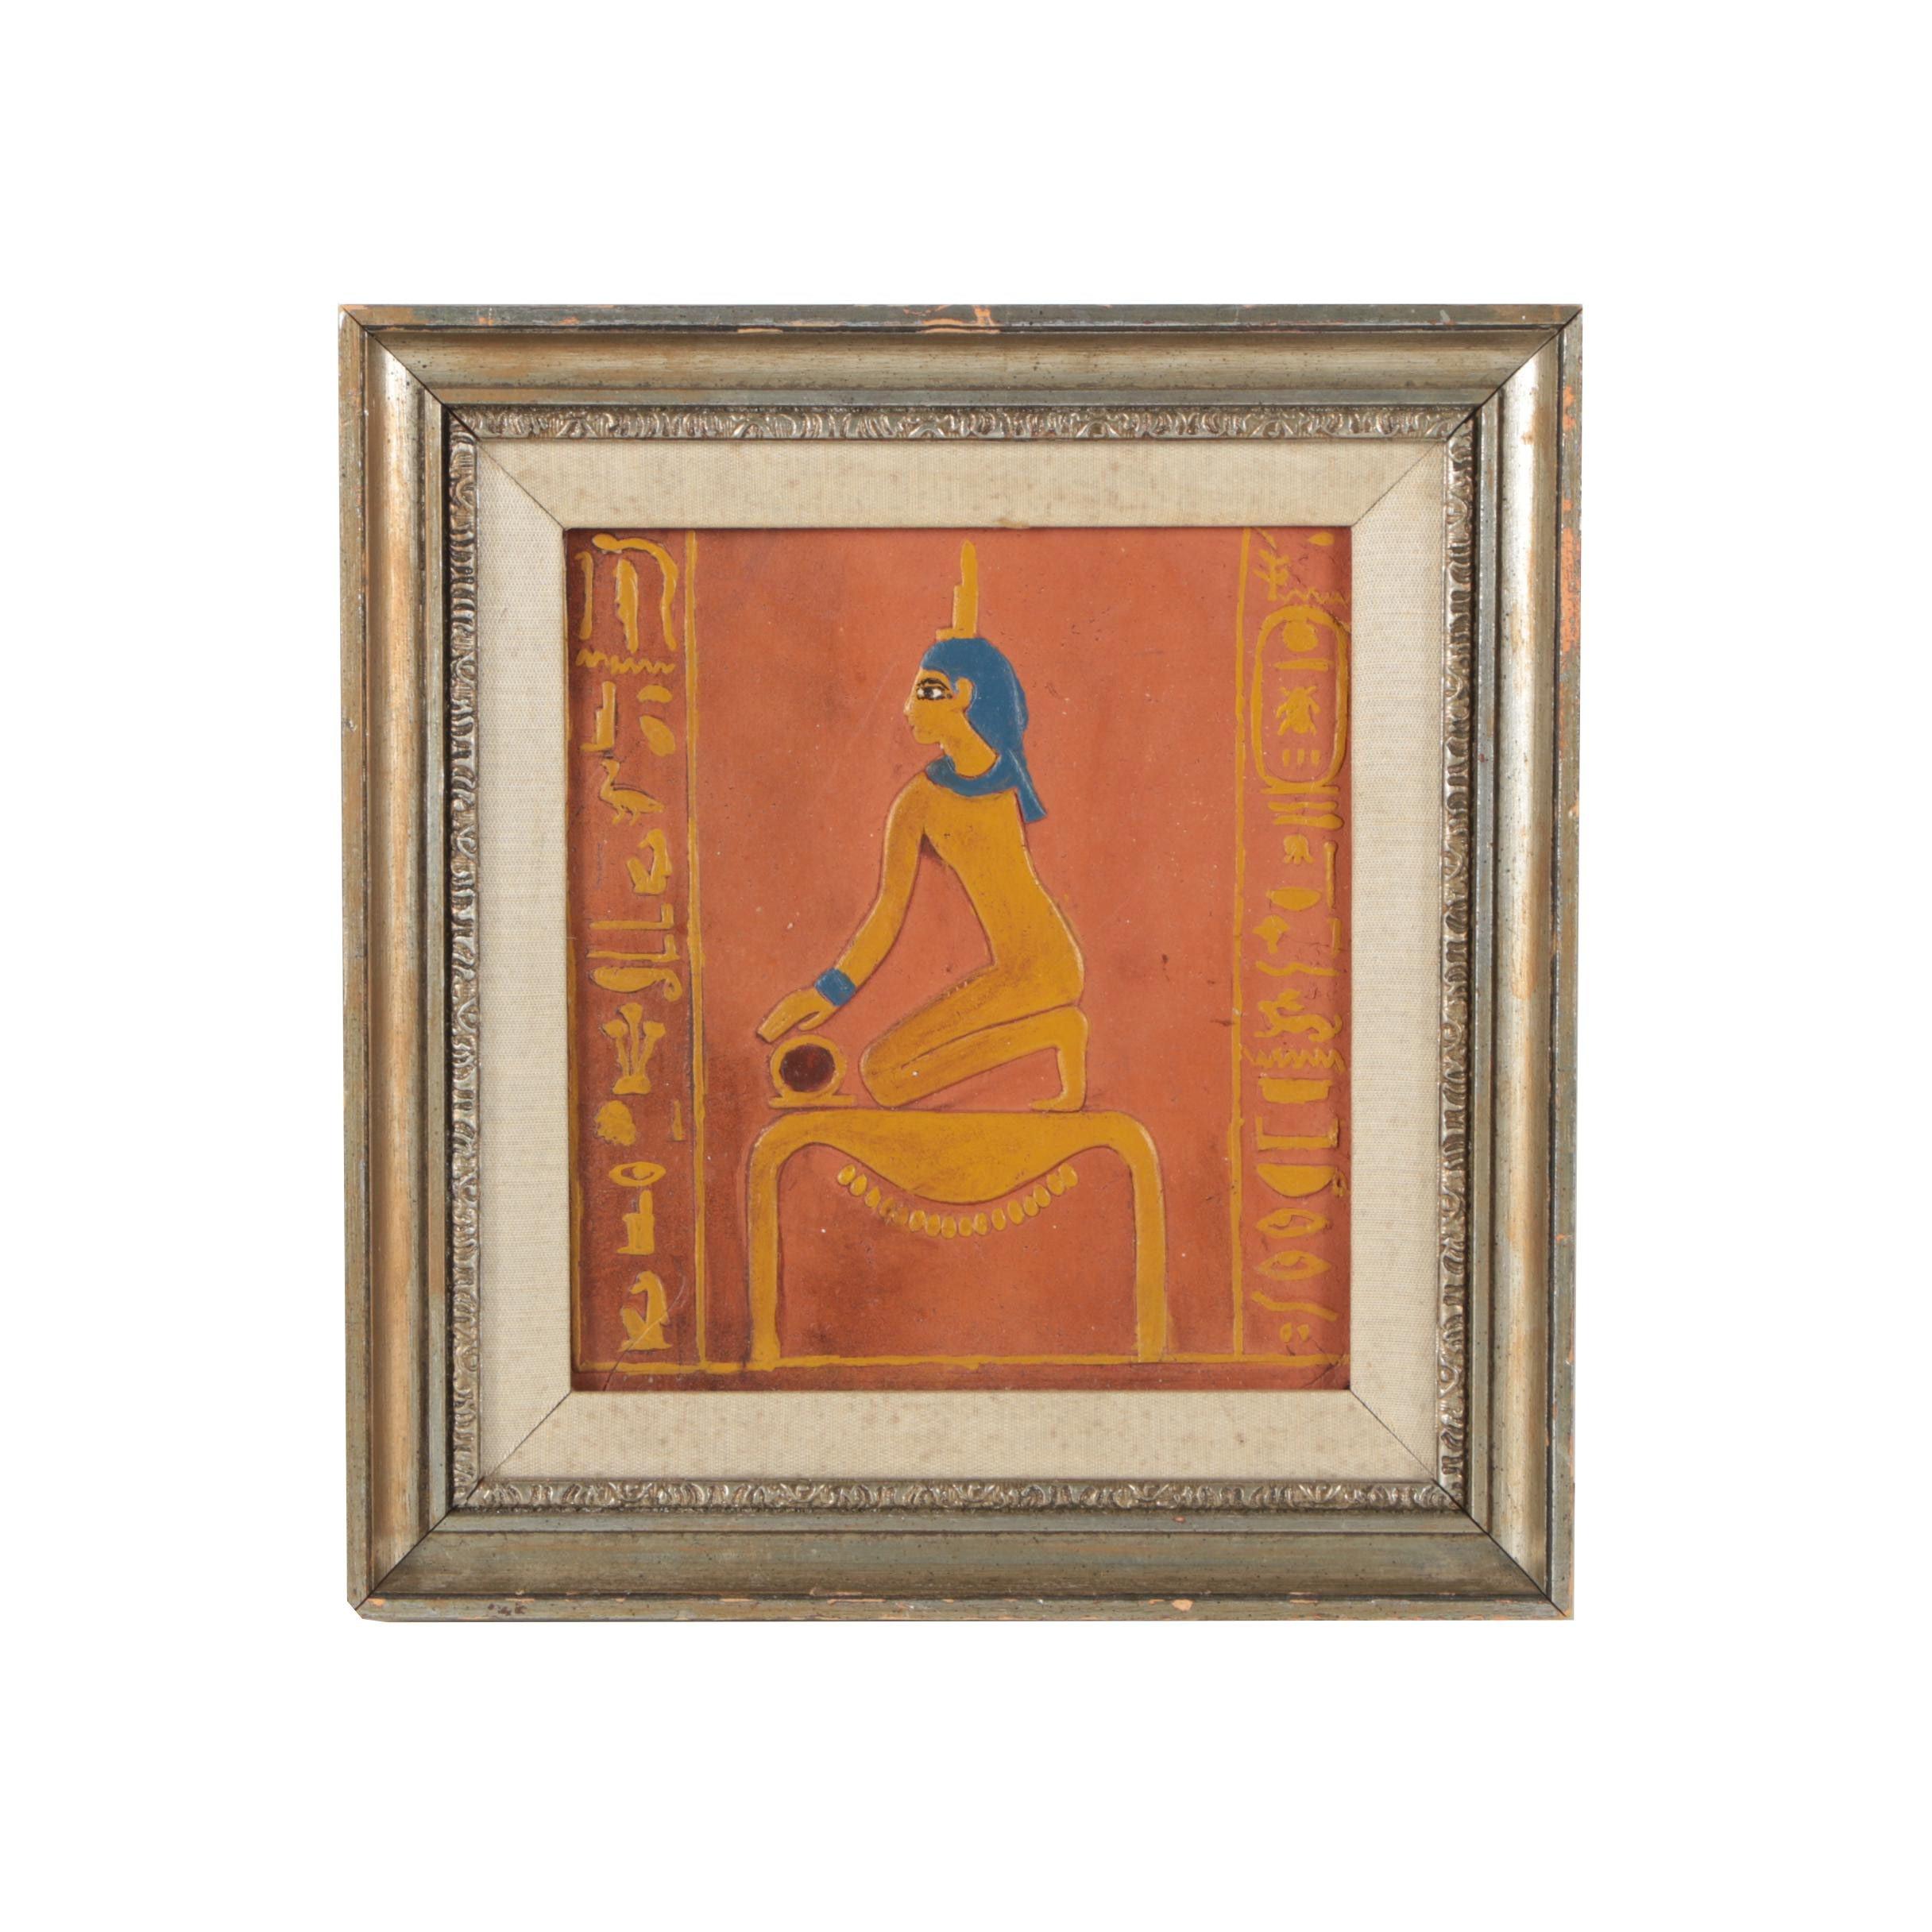 Hand Painted Ceramic Tile of Hieroglyphic Scene